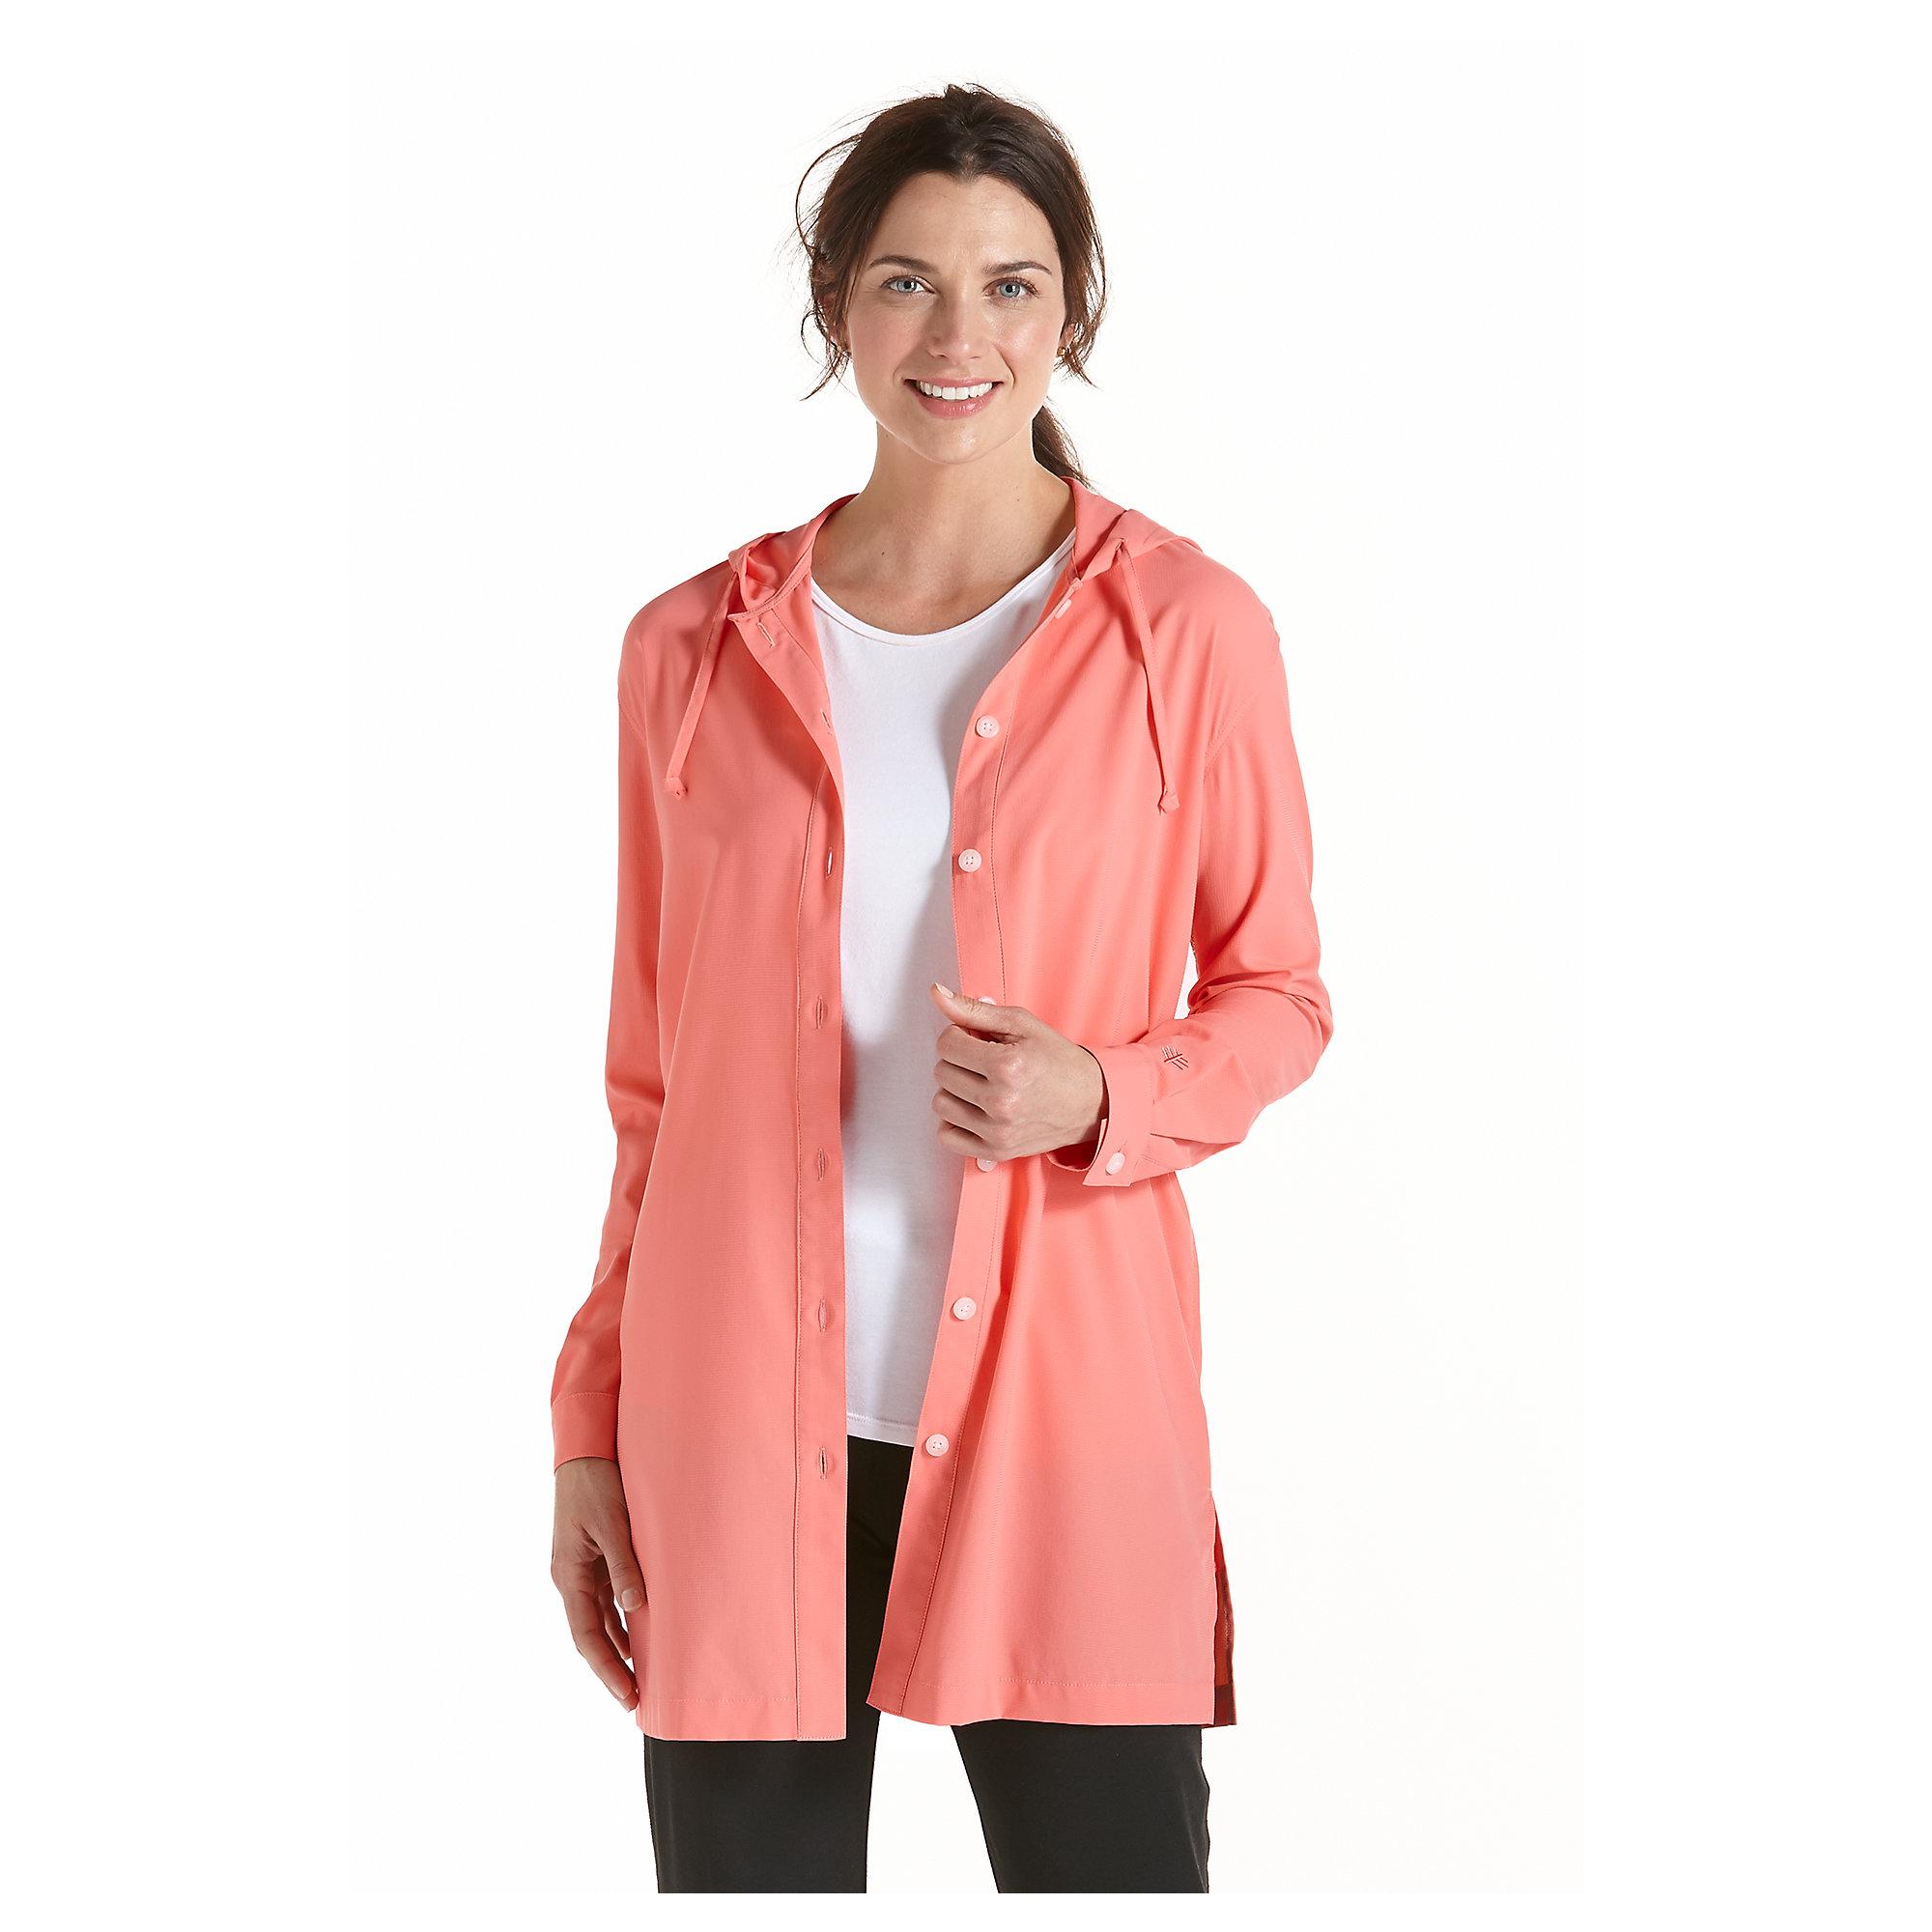 Coolibar upf 50 womens beach shirt sun protection for Custom sun protection shirts